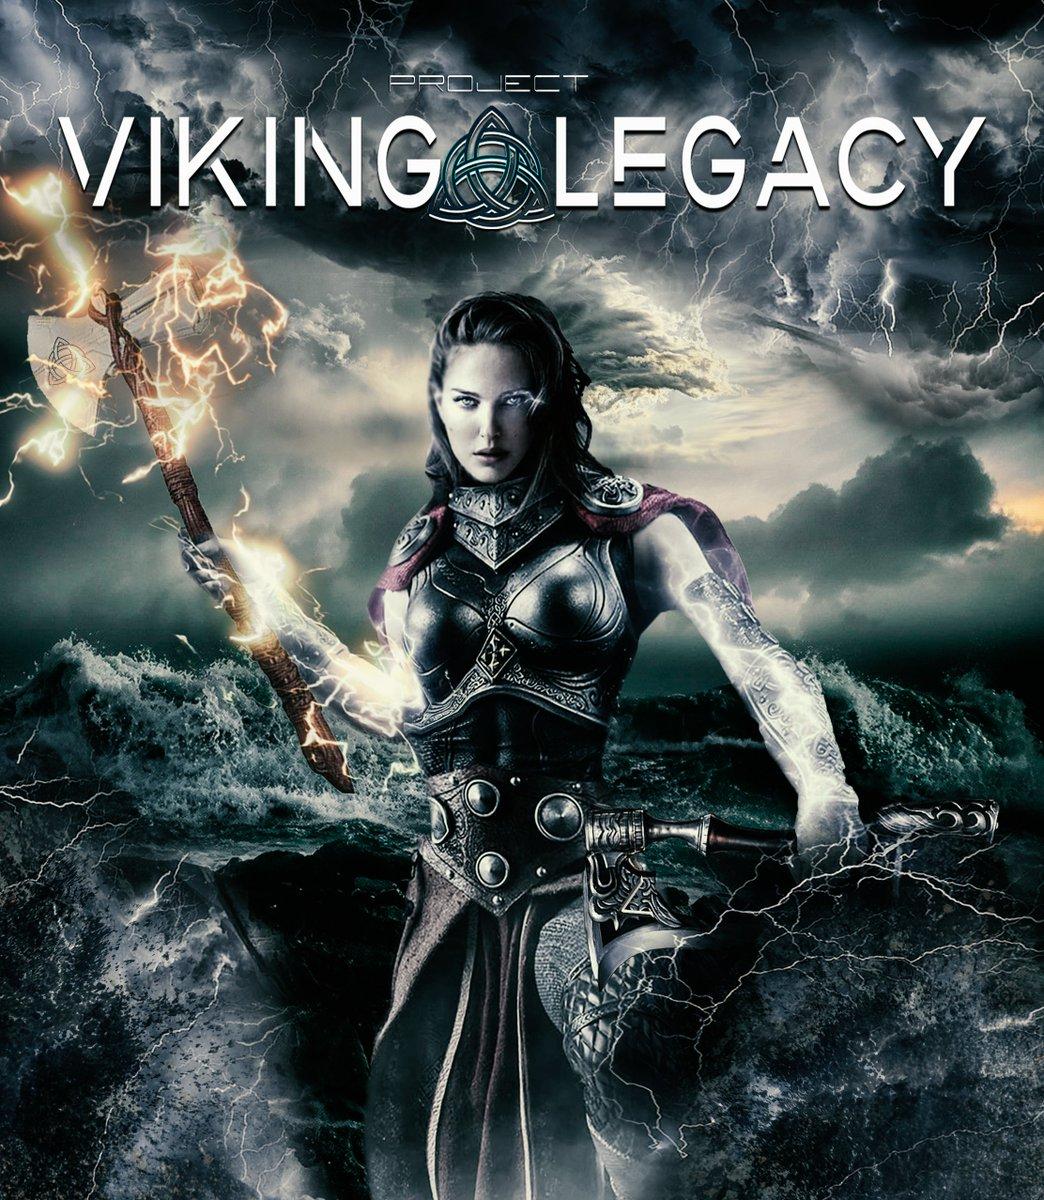 PROJECT: Viking Legacy Genre: Fantasy Action Adventure Character: Zaya Model: Nathalie Portman #Xbox #gamingindustry #writing #creation #gaming #concepts #conceptart #Fantasy #Scifi #Actionadventure #sony #development #games #cosplay #NextGenpic.twitter.com/6LbdPQk2HG